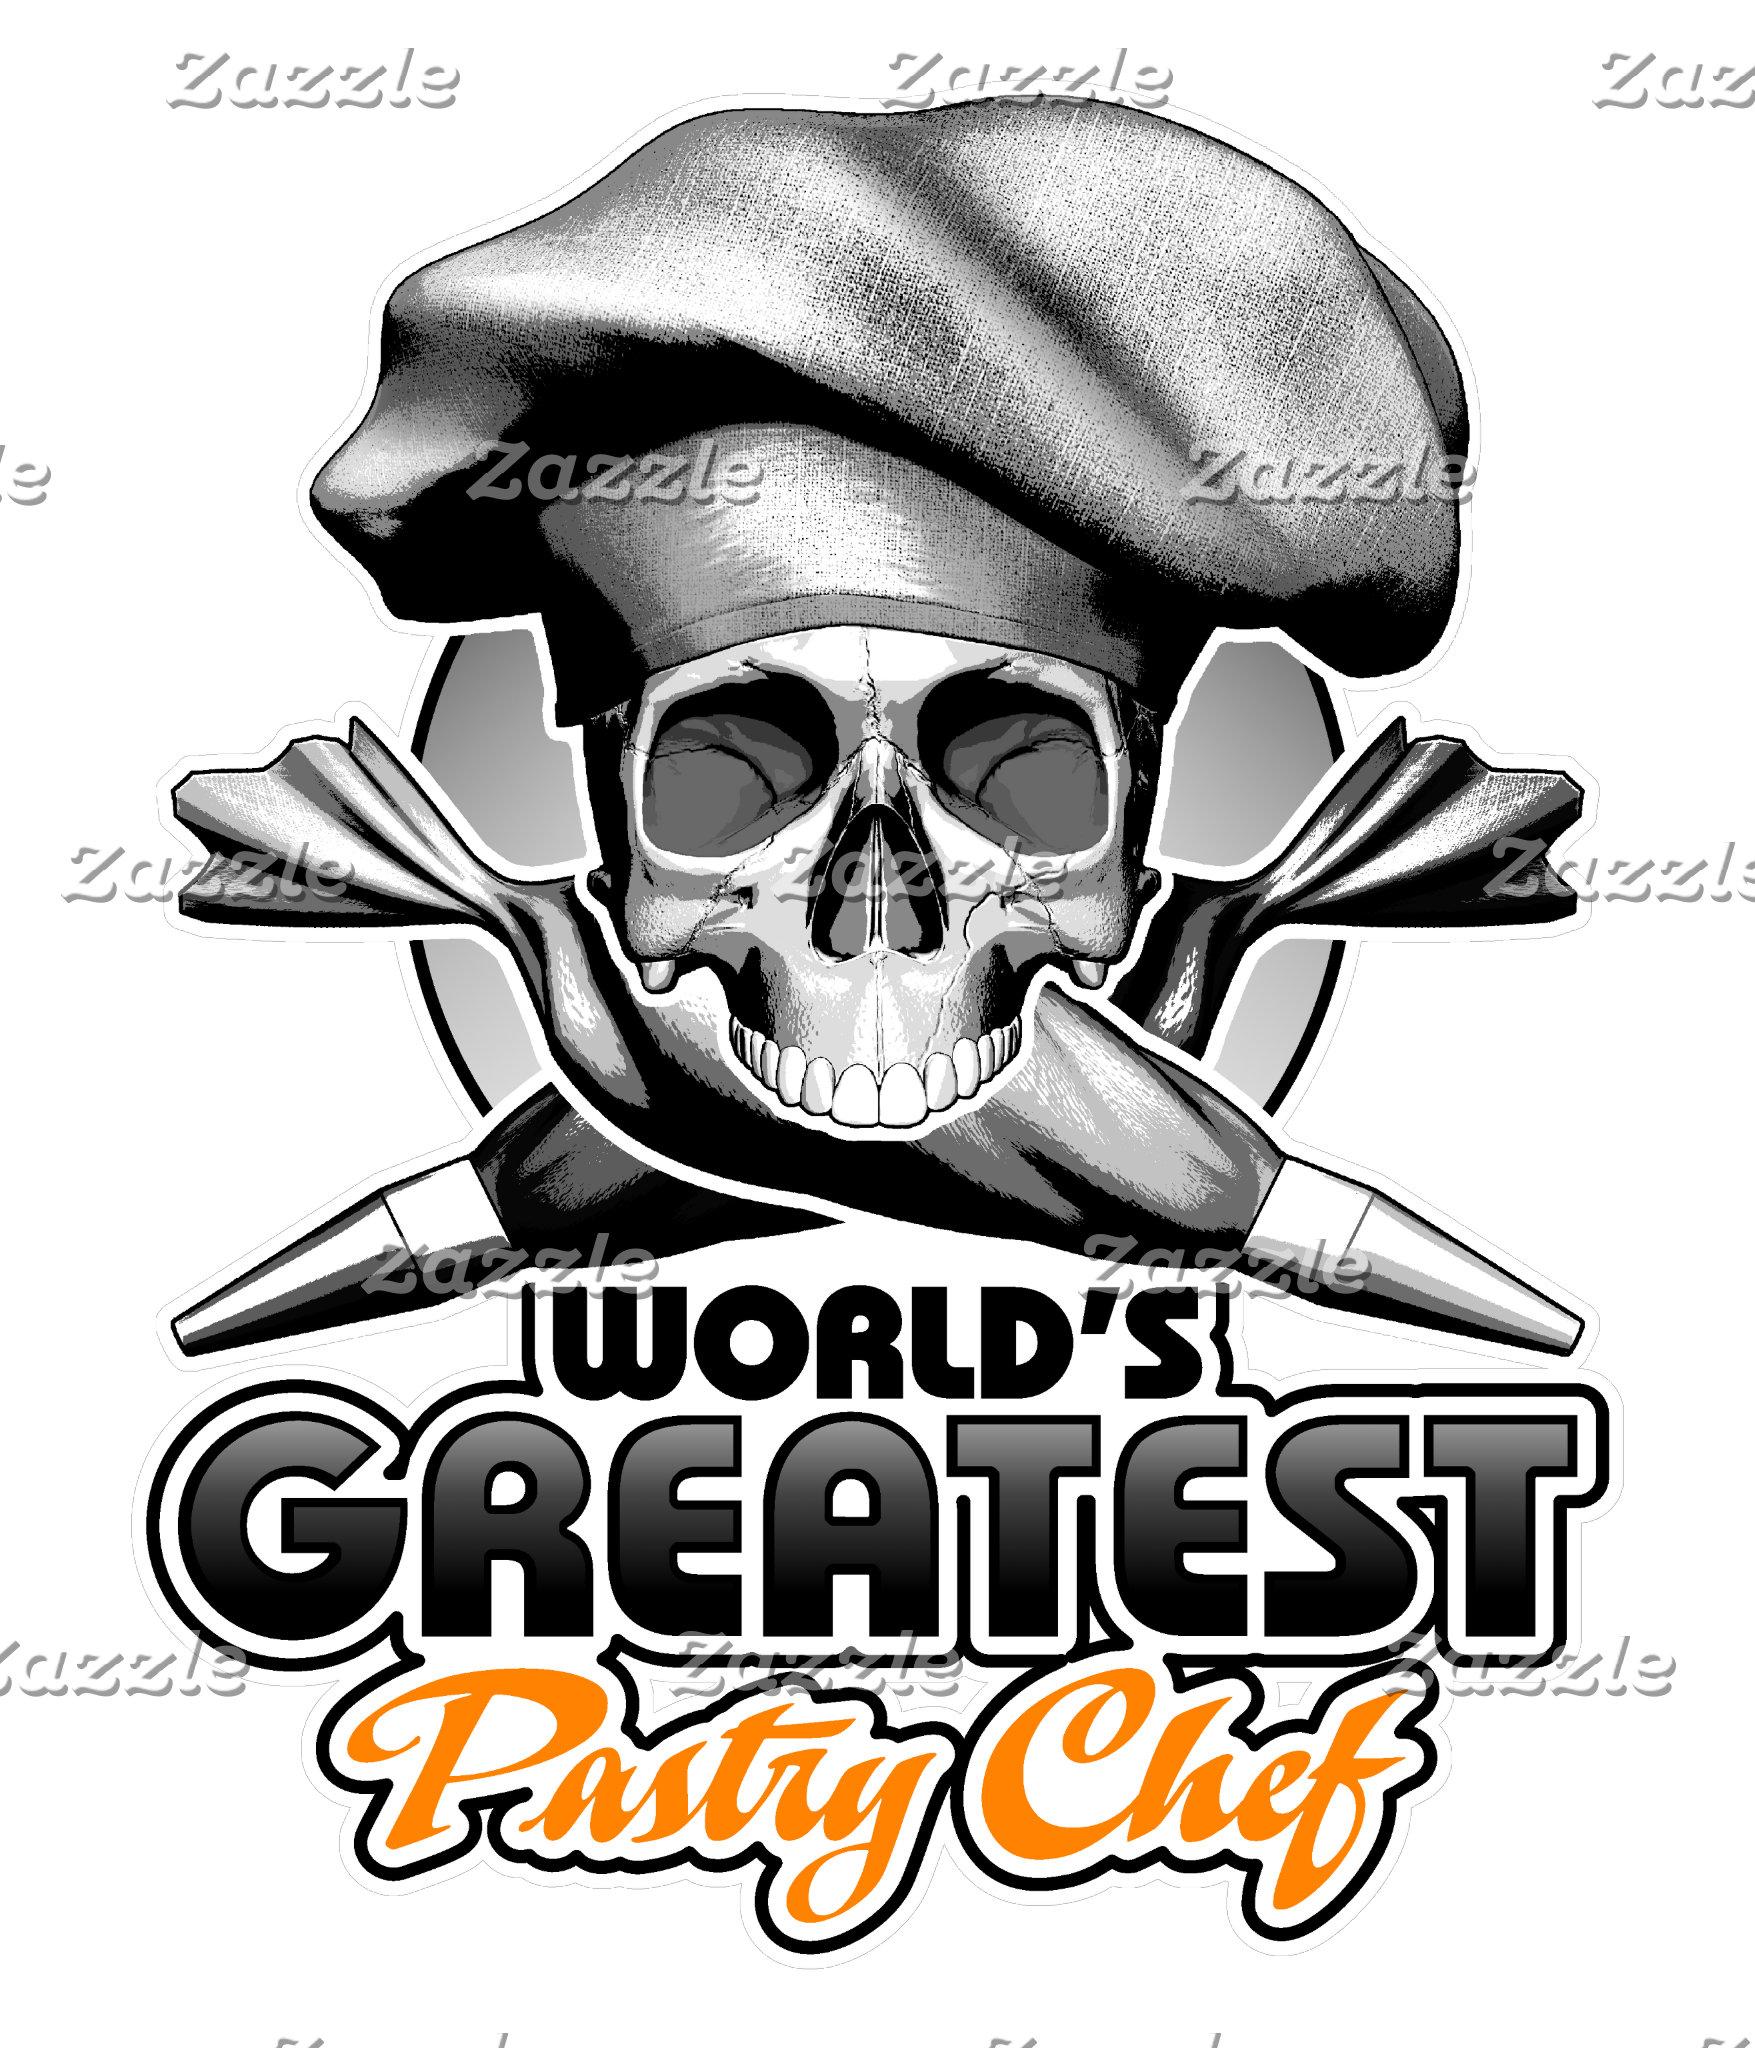 World's Greatest Pastry Chef v6